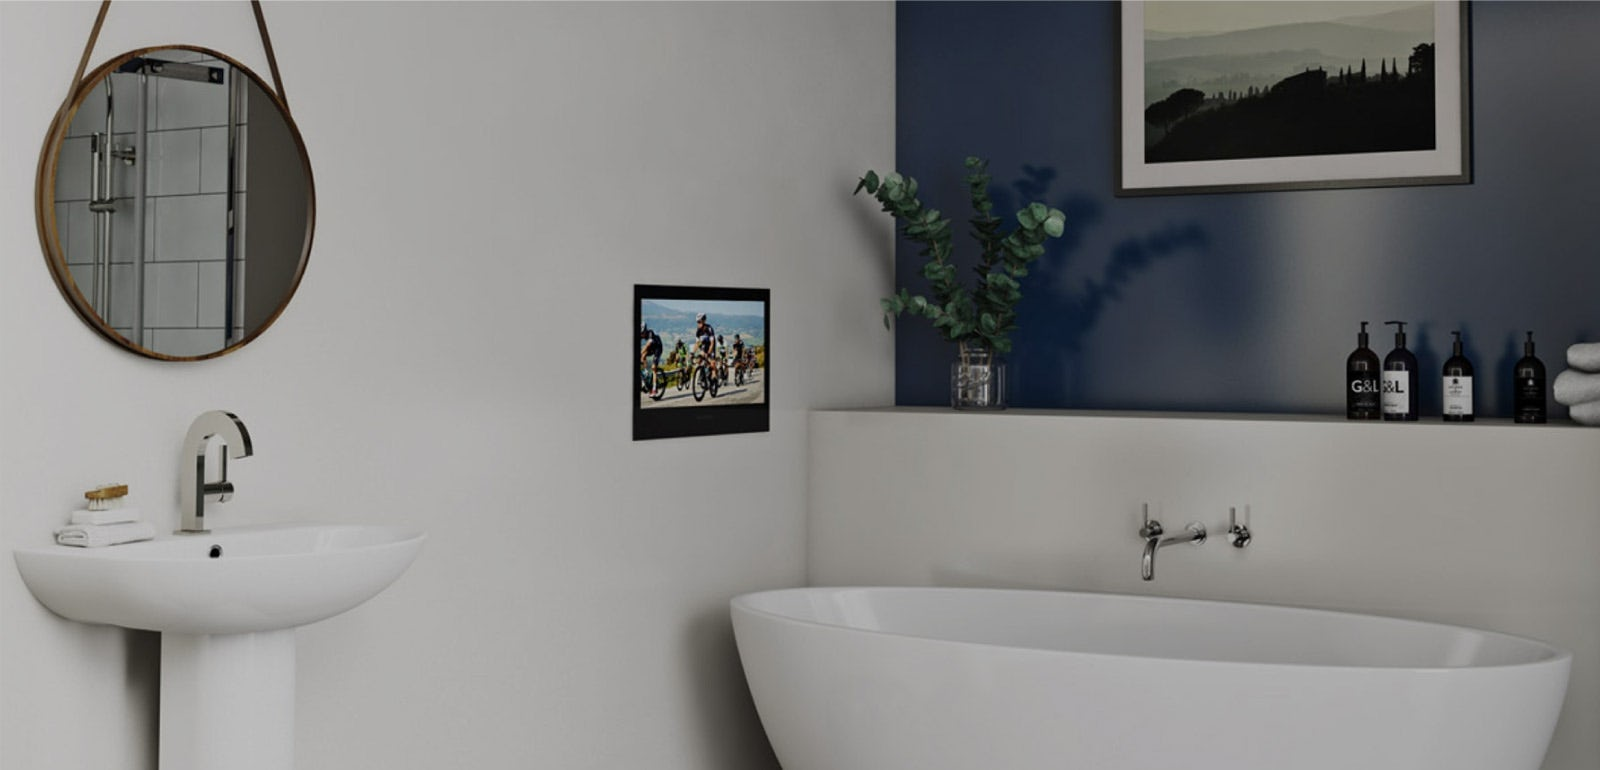 Bathroom Accessories Bathroom Accessory Sets Victoriaplum Com